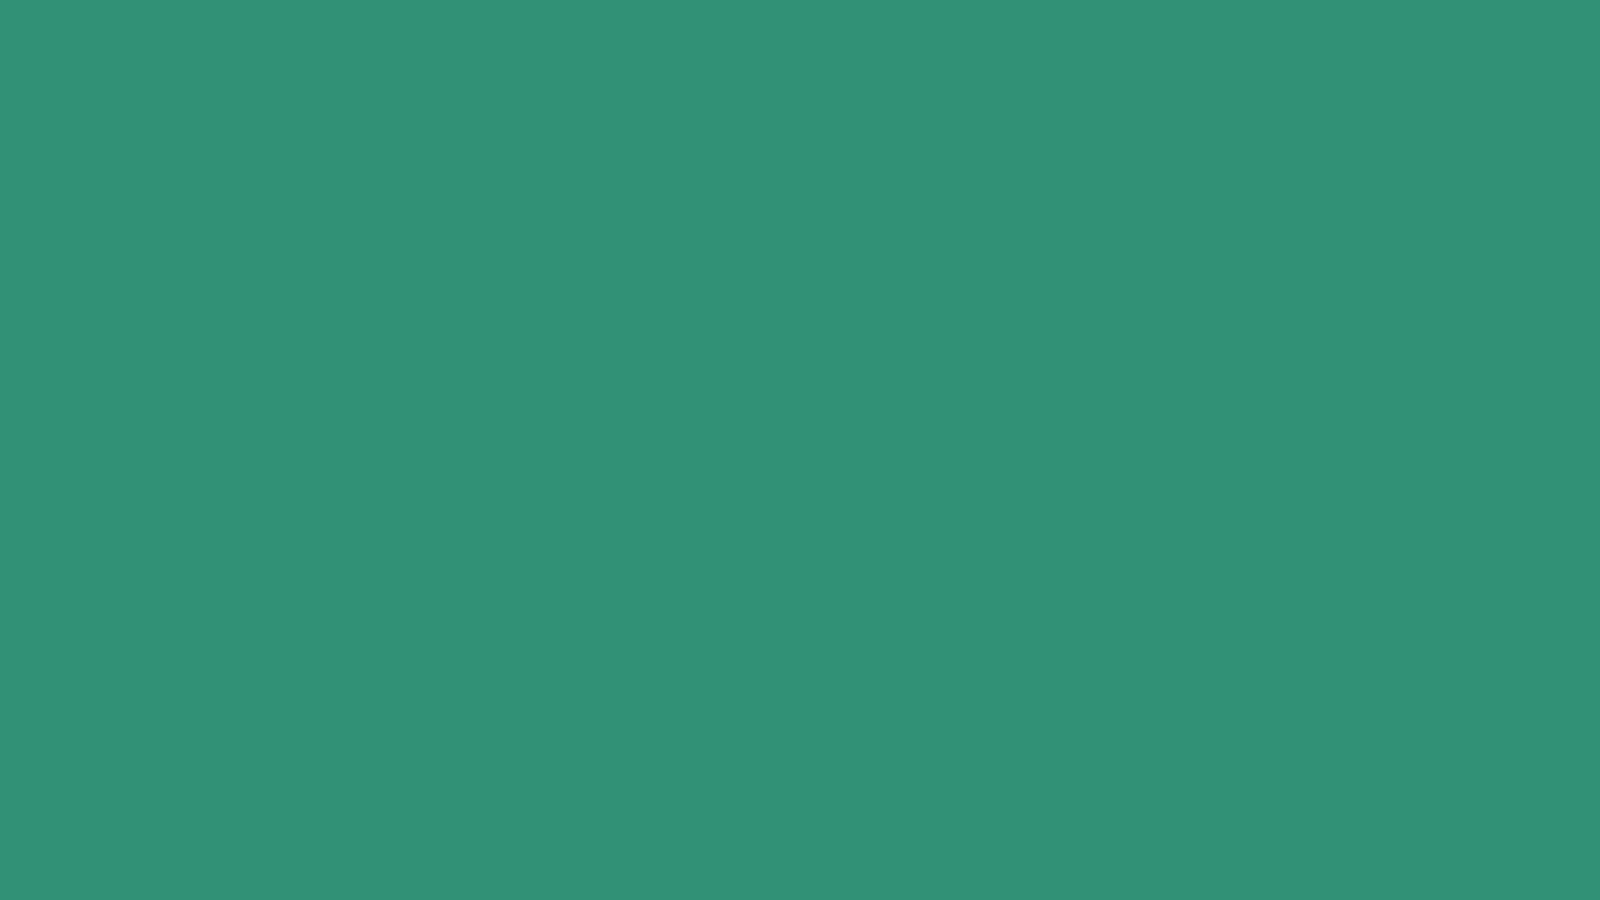 1600x900 Illuminating Emerald Solid Color Background